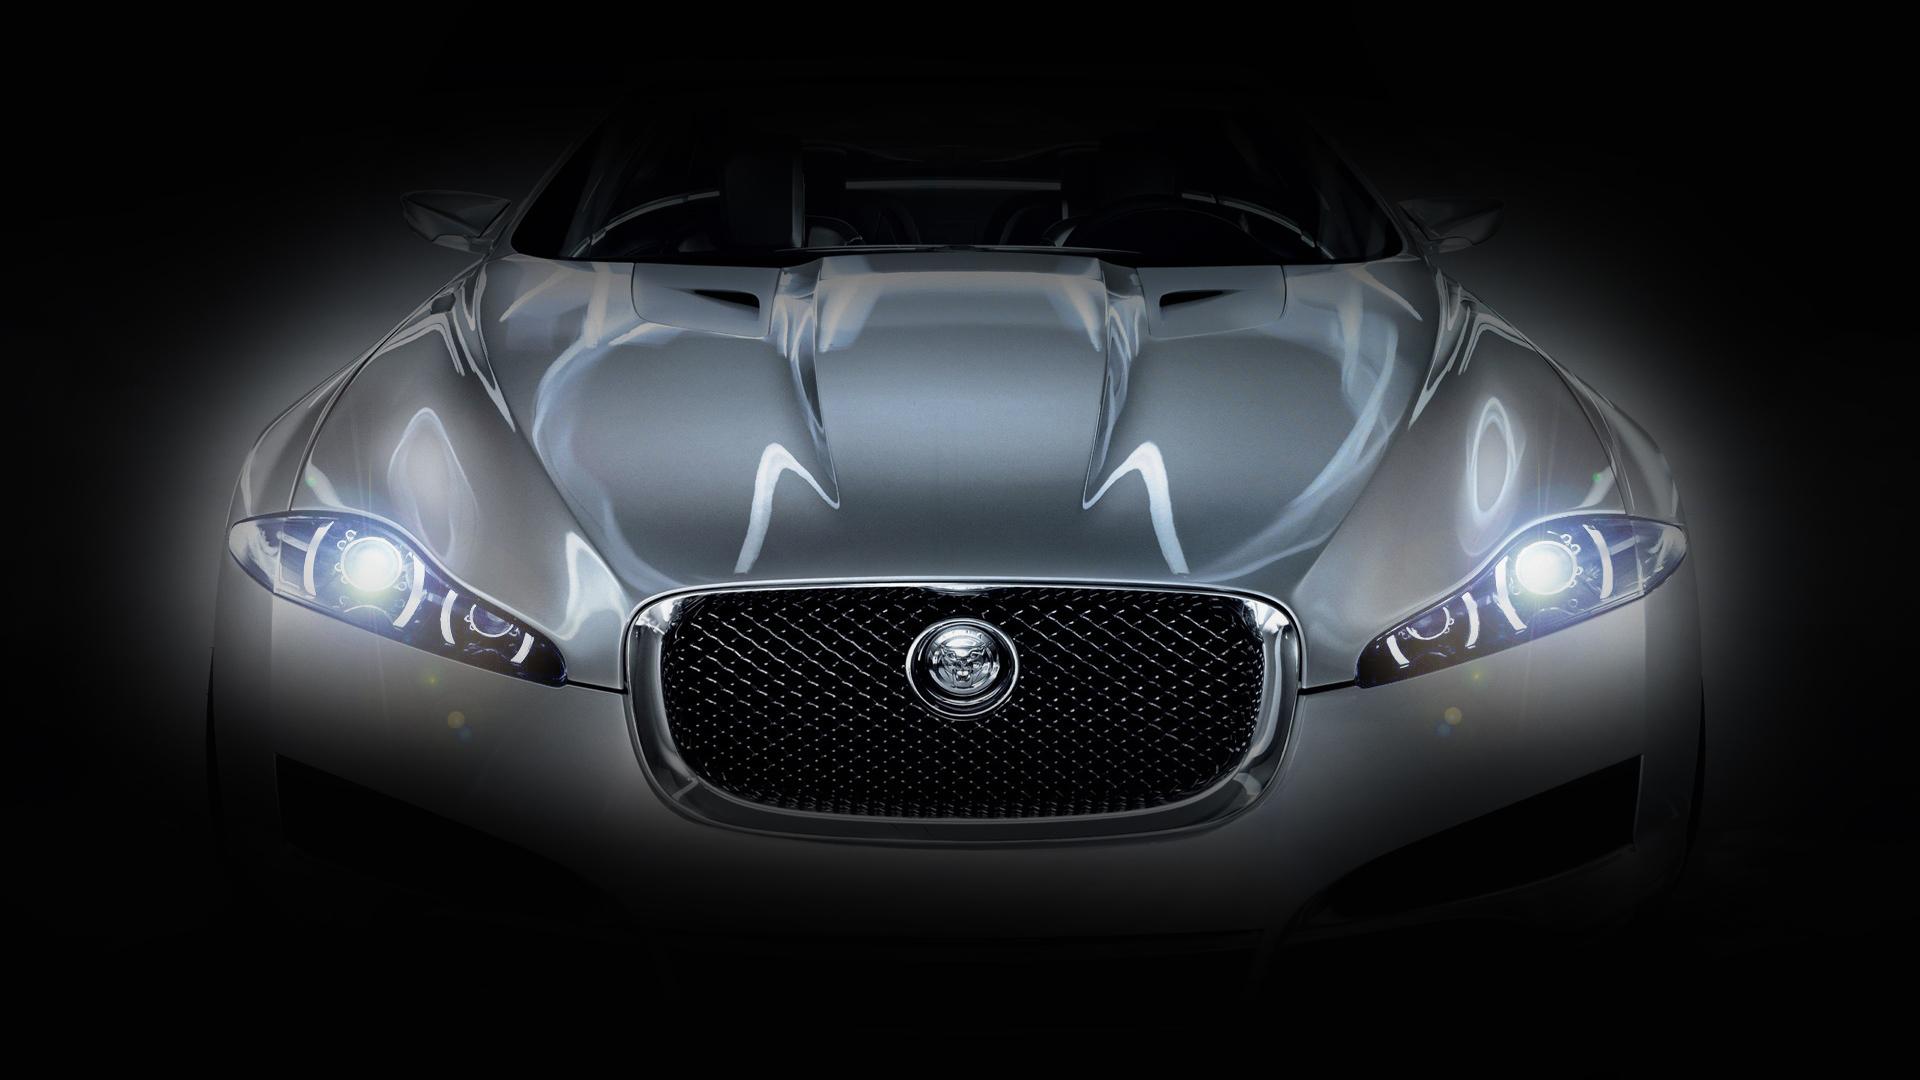 xenon headlights autozone Lamps and lighting 1920x1080